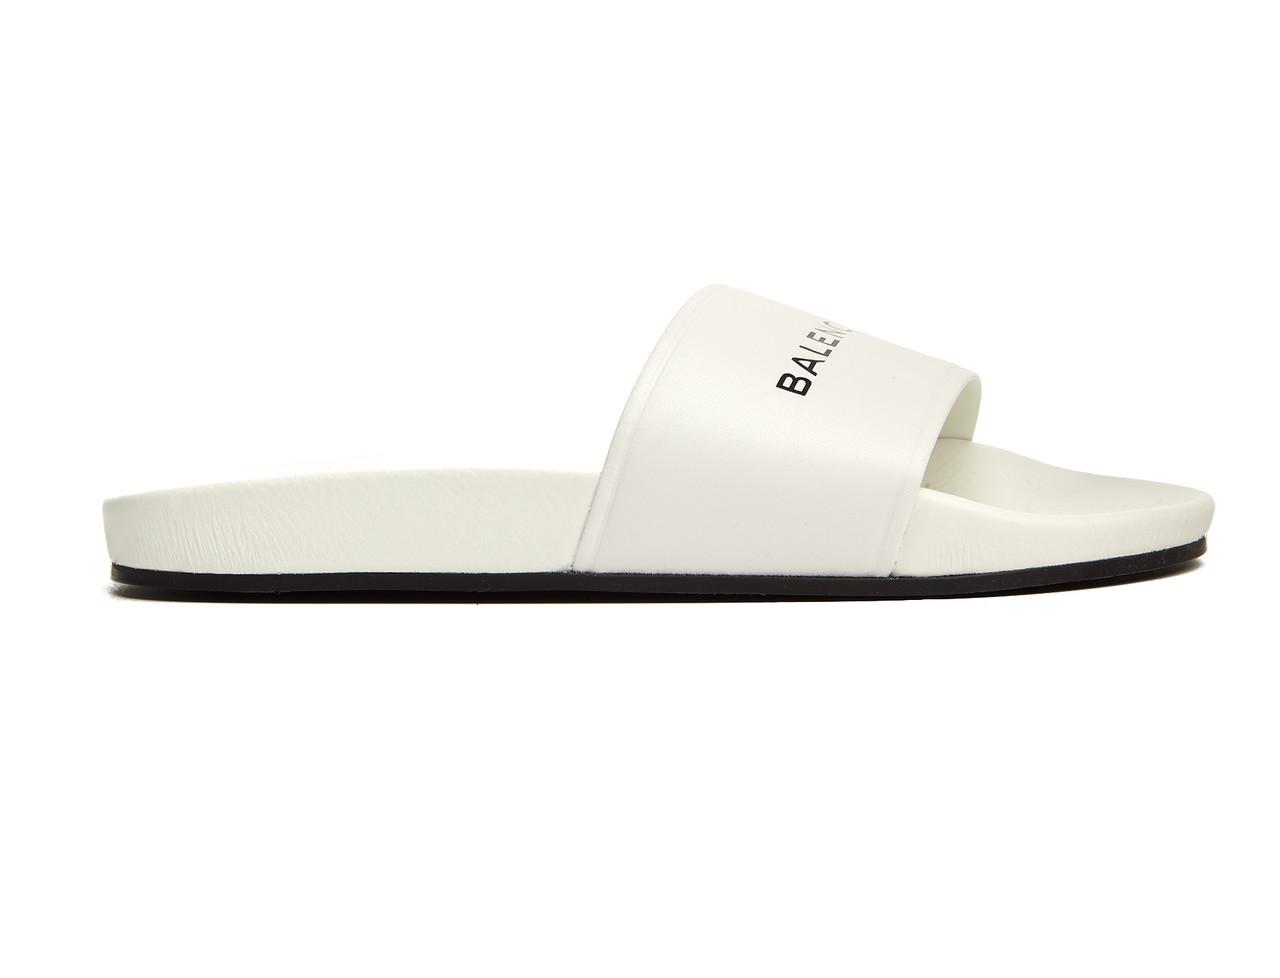 729bc953 Женские шлепанцы, сланцы Balenciaga Slippers White (Баленсиага, белые),  цена 1 150 грн., купить в Киеве — Prom.ua (ID#700993598)